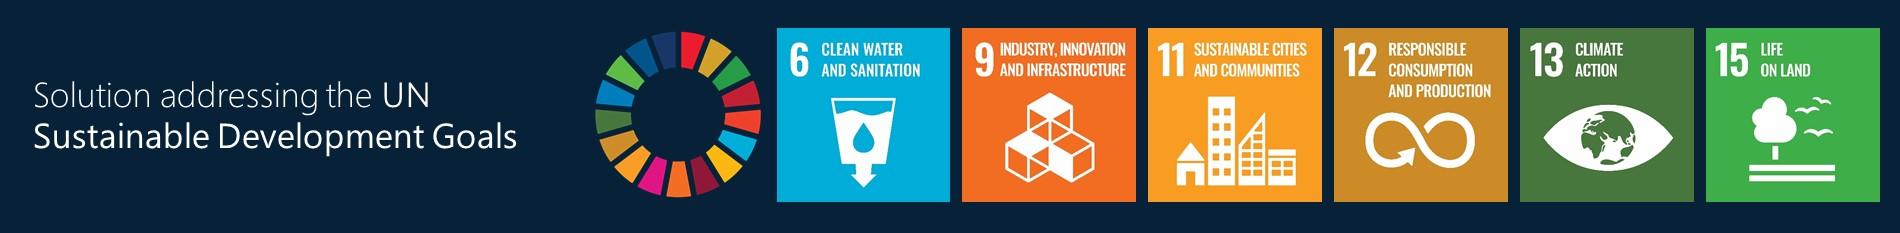 Sustainable Development Goals UN Studies and planning Altereo